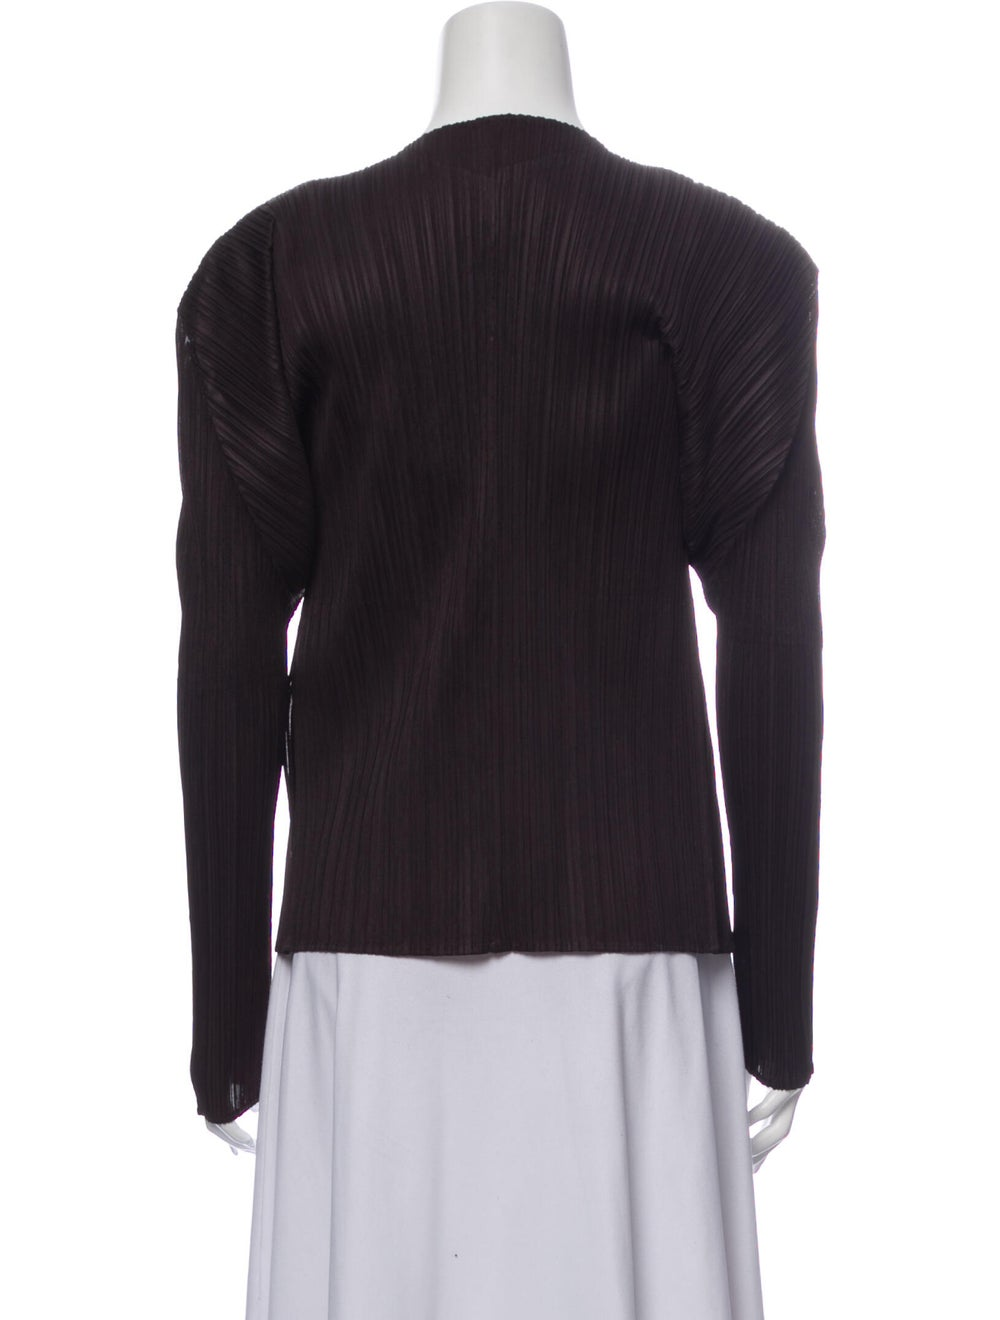 Pleats Please Issey Miyake Open Front Sweater Bla… - image 3